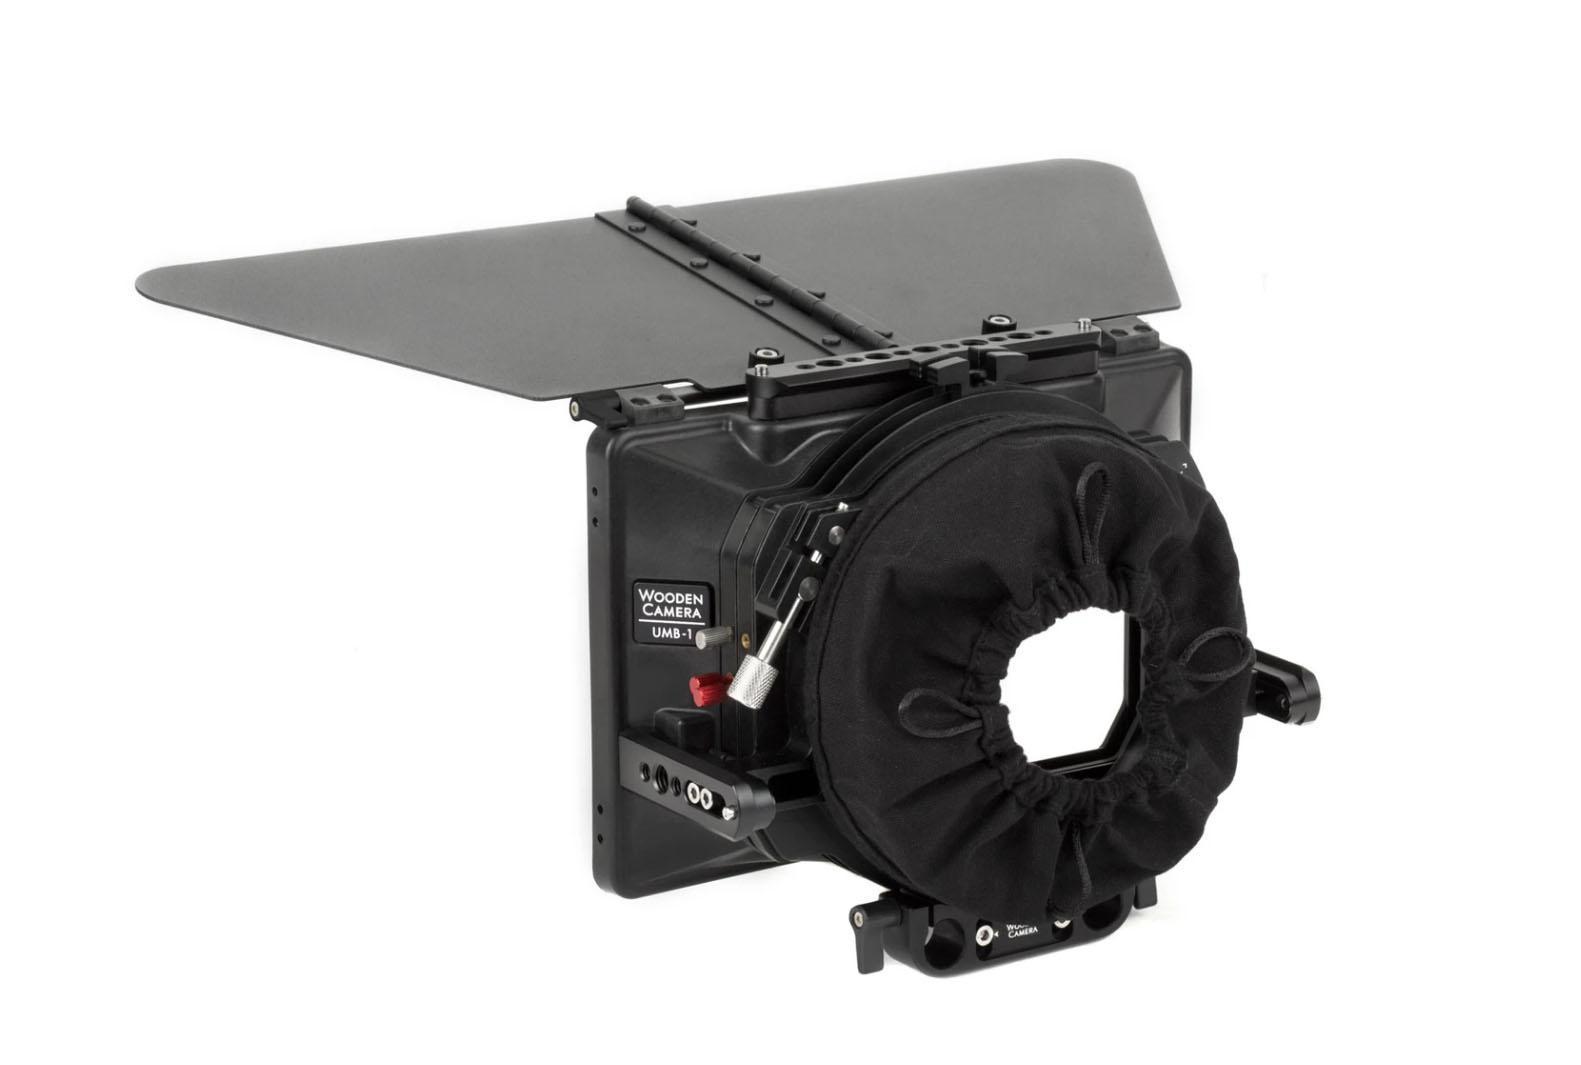 Wooden Camera – UMB 1 Universal Mattebox Base